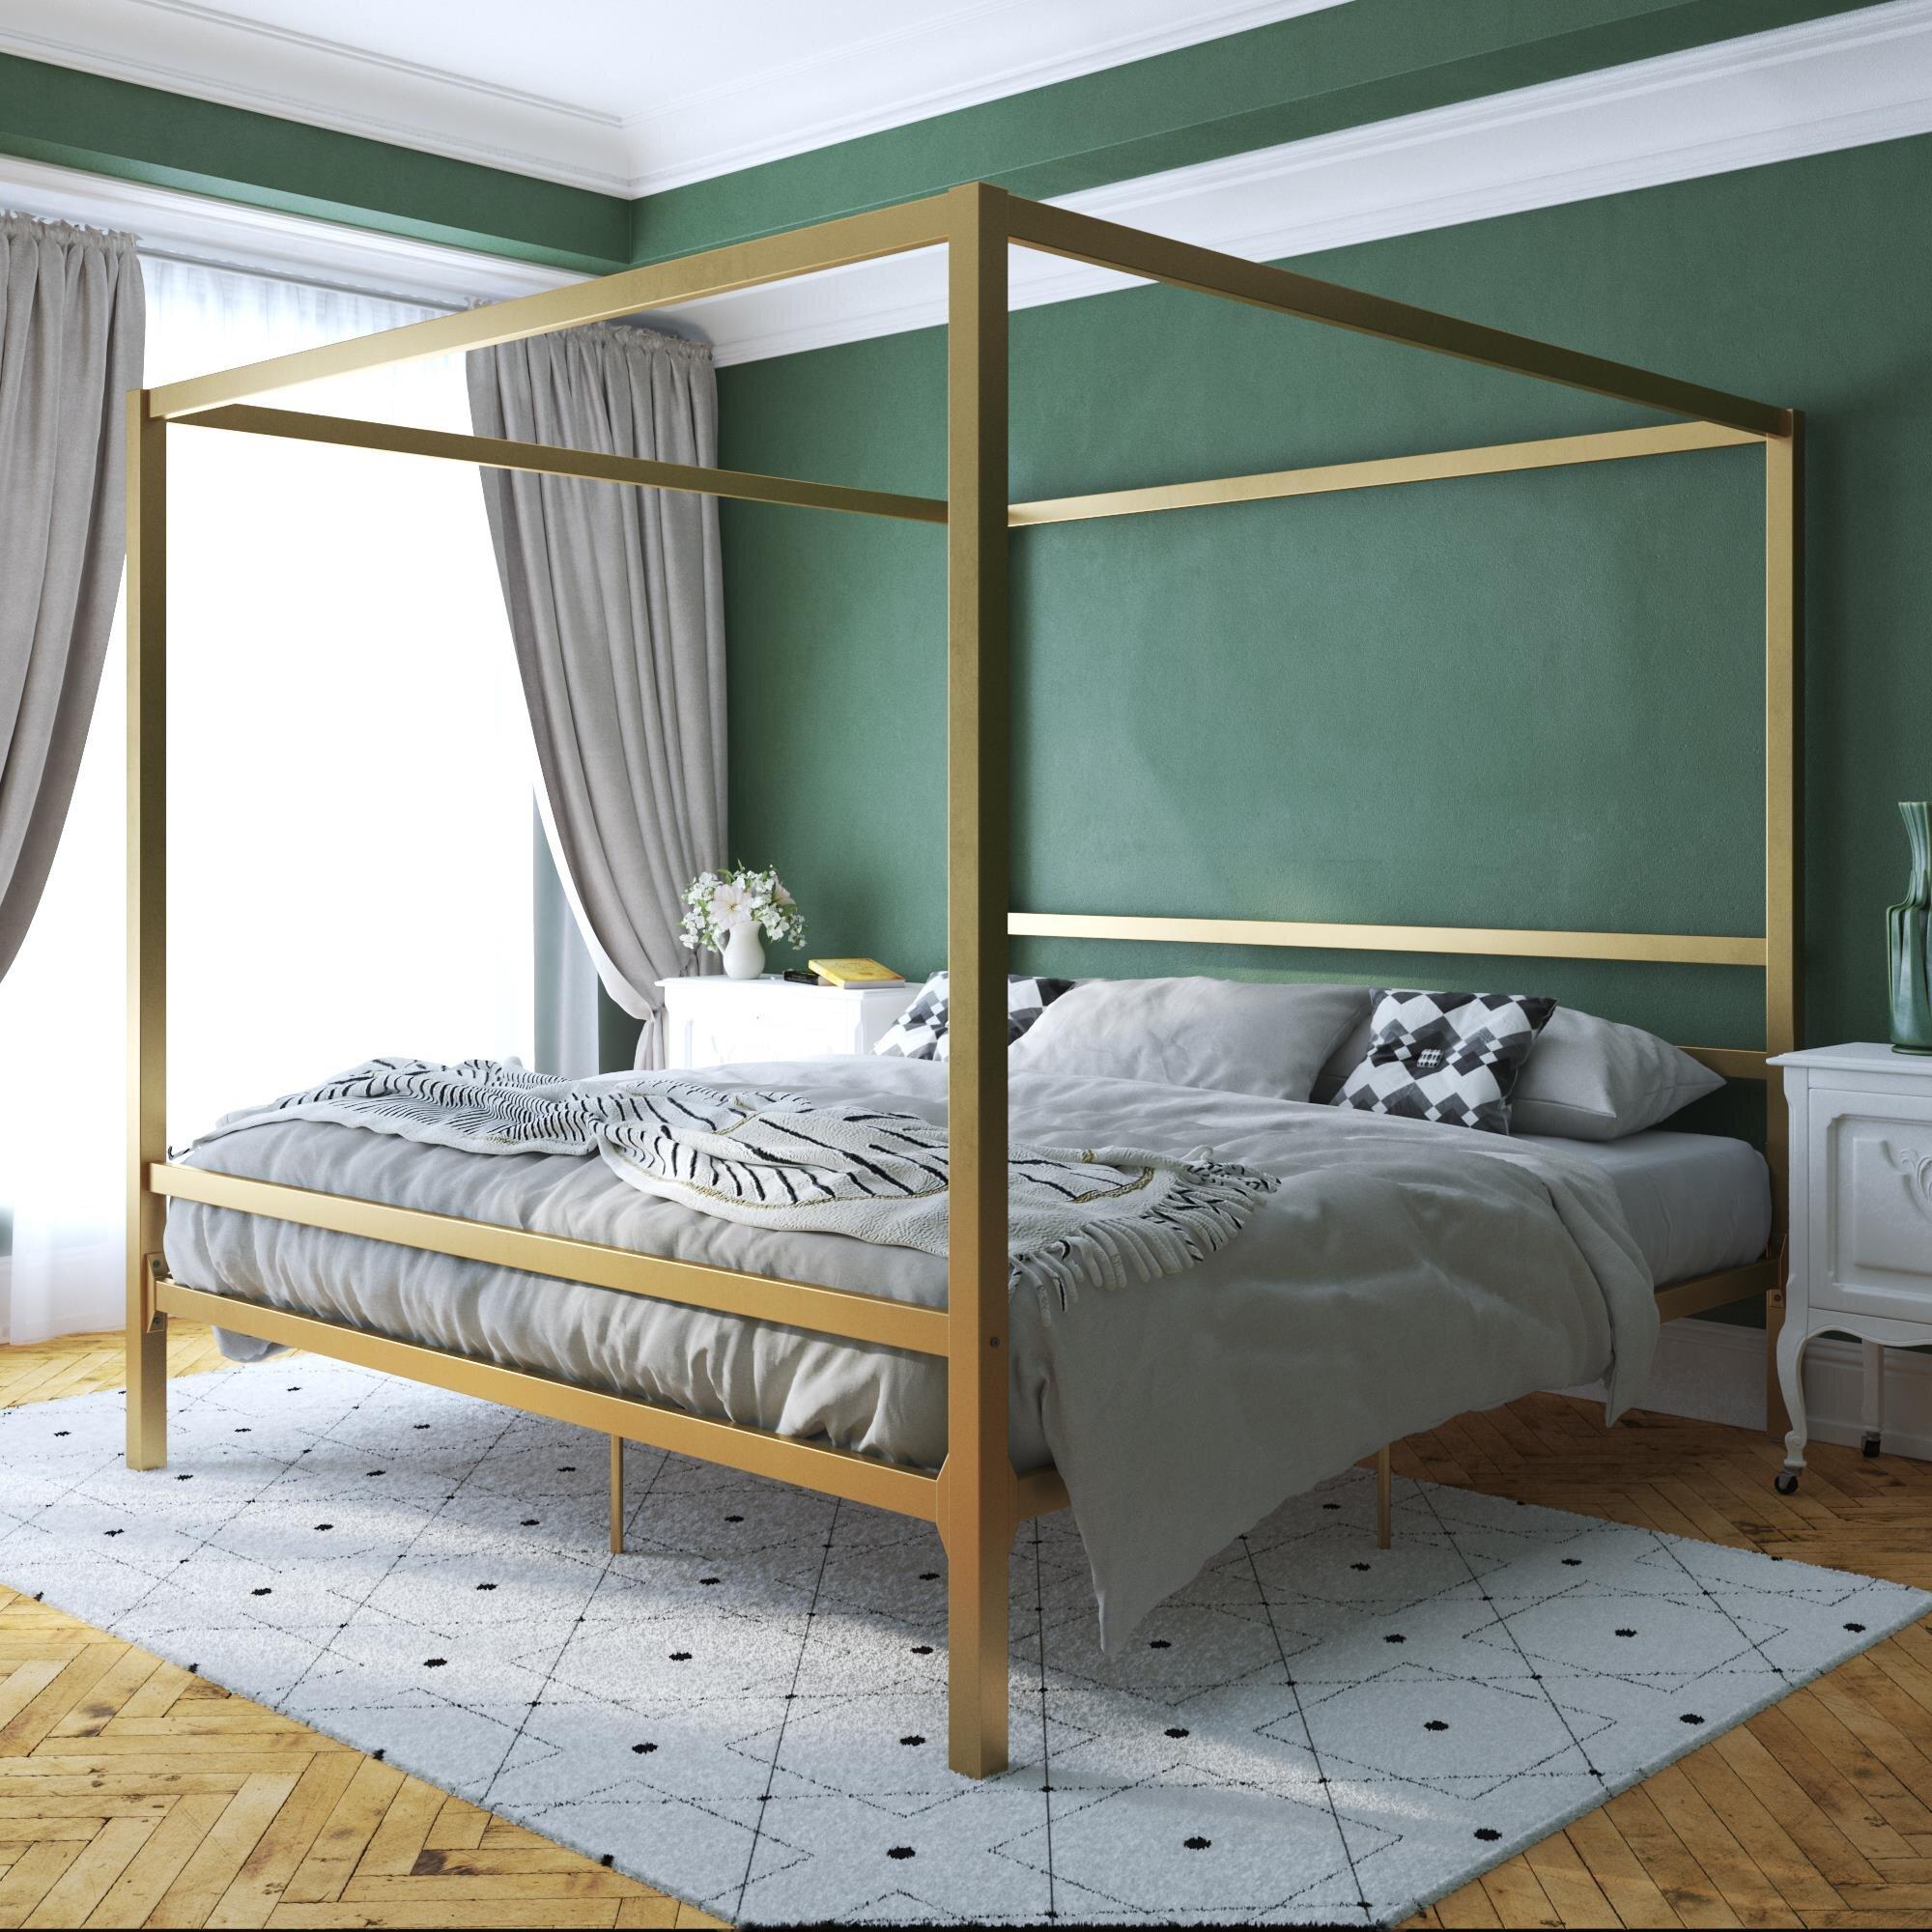 Canopy Beds Up To 60 Off Through 01 05 Wayfair